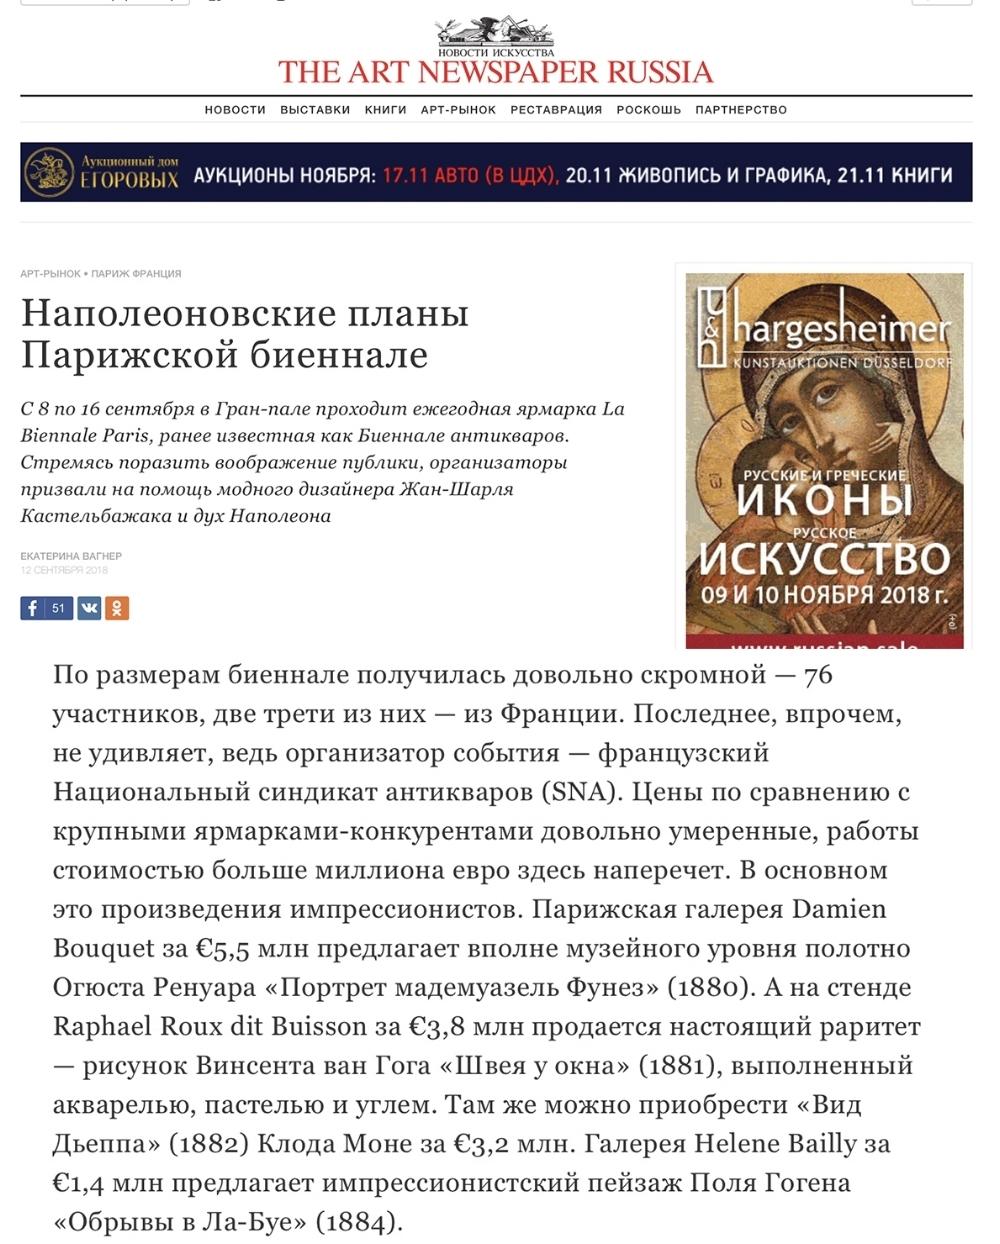 The Art Newspaper Russia - September 2018